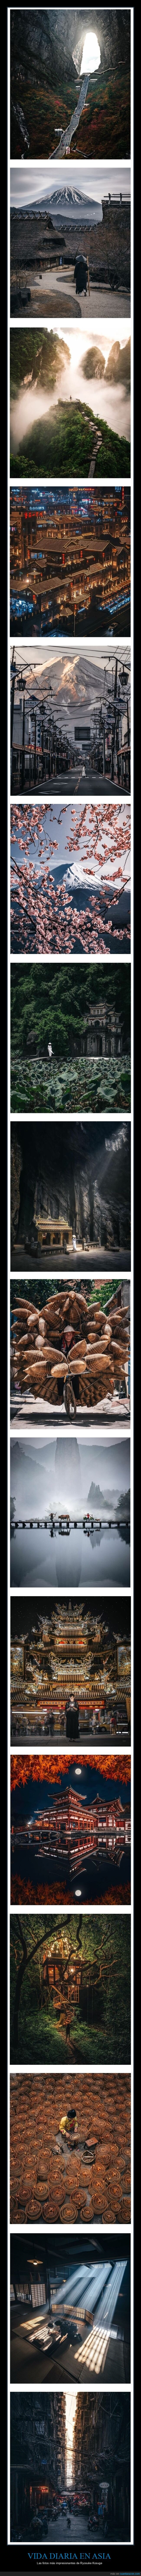 asia,fotografía,ryosuke kosuge